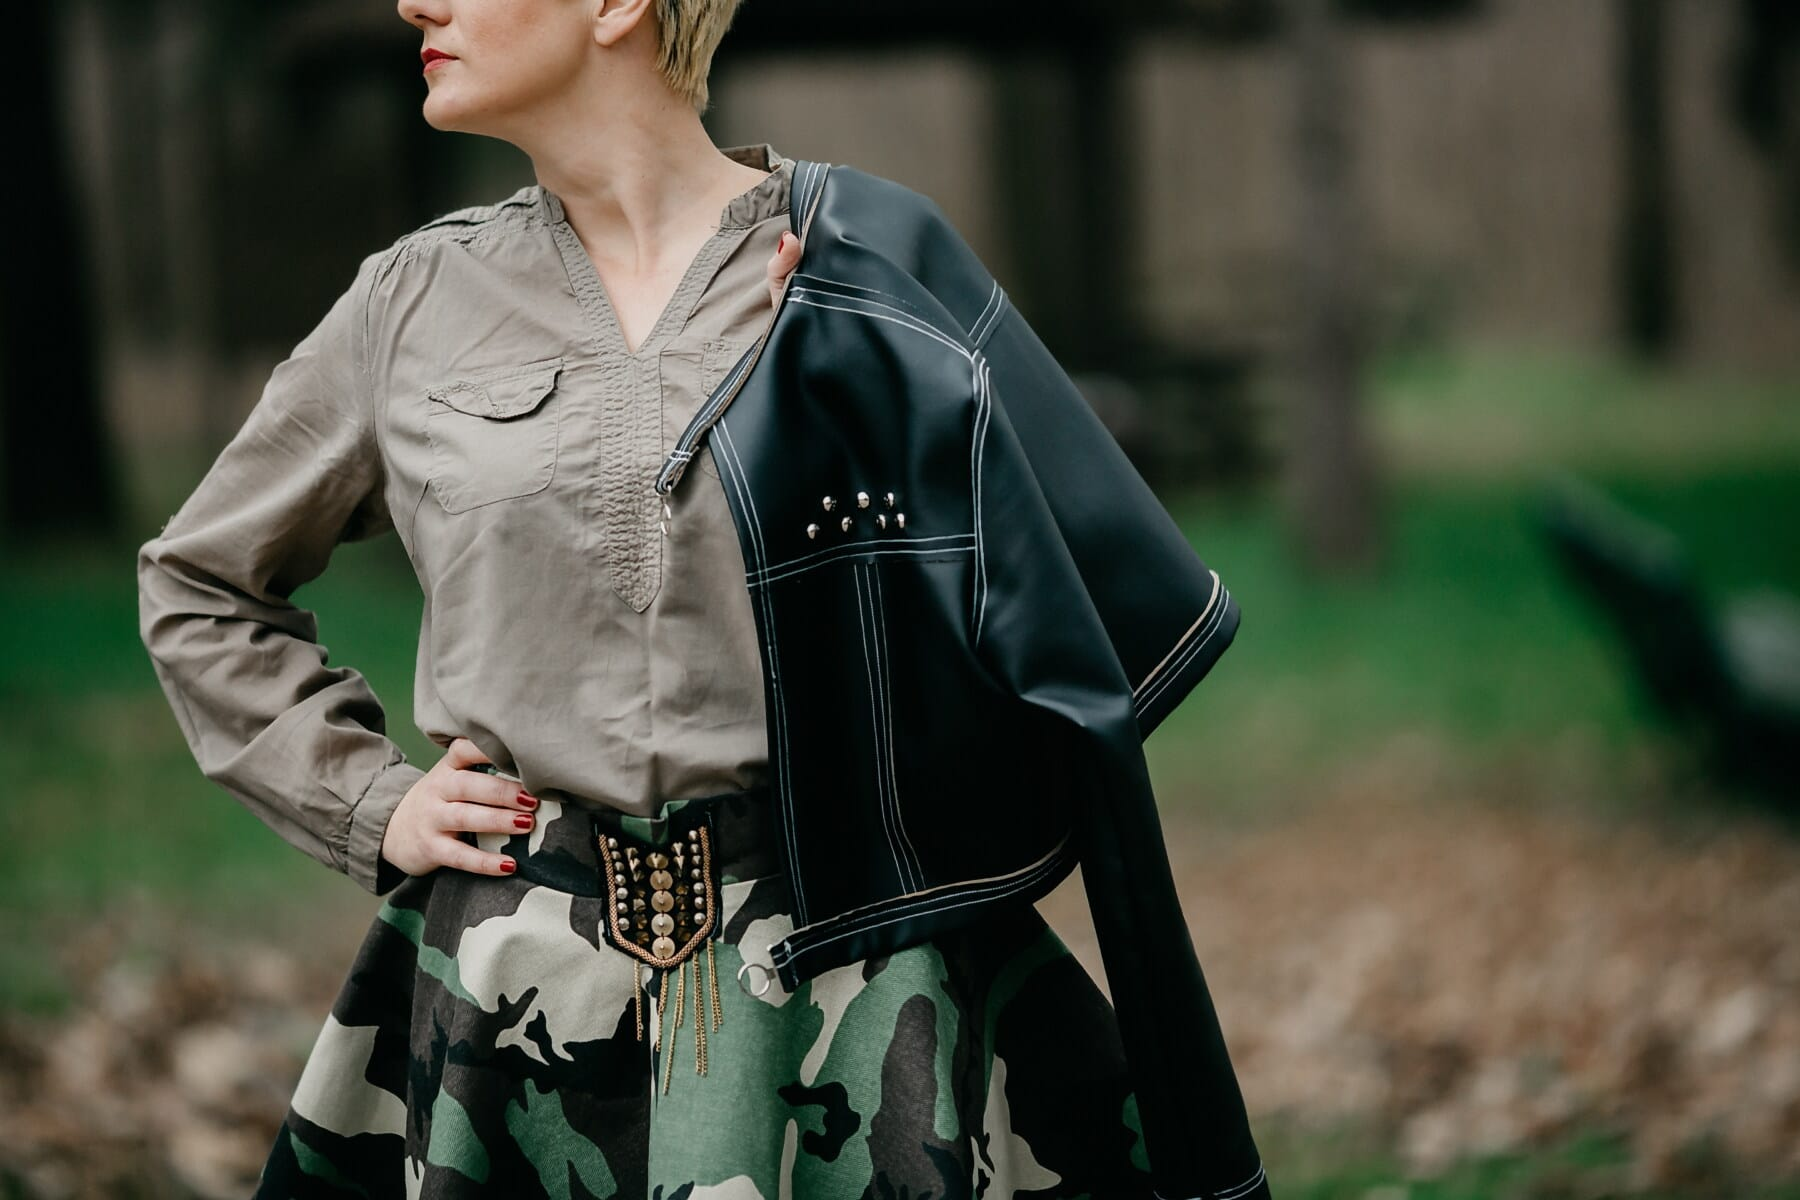 proiectare, militare, costum, moda, din piele, Jacheta, rochie, tanara, gratuit stil, femeie